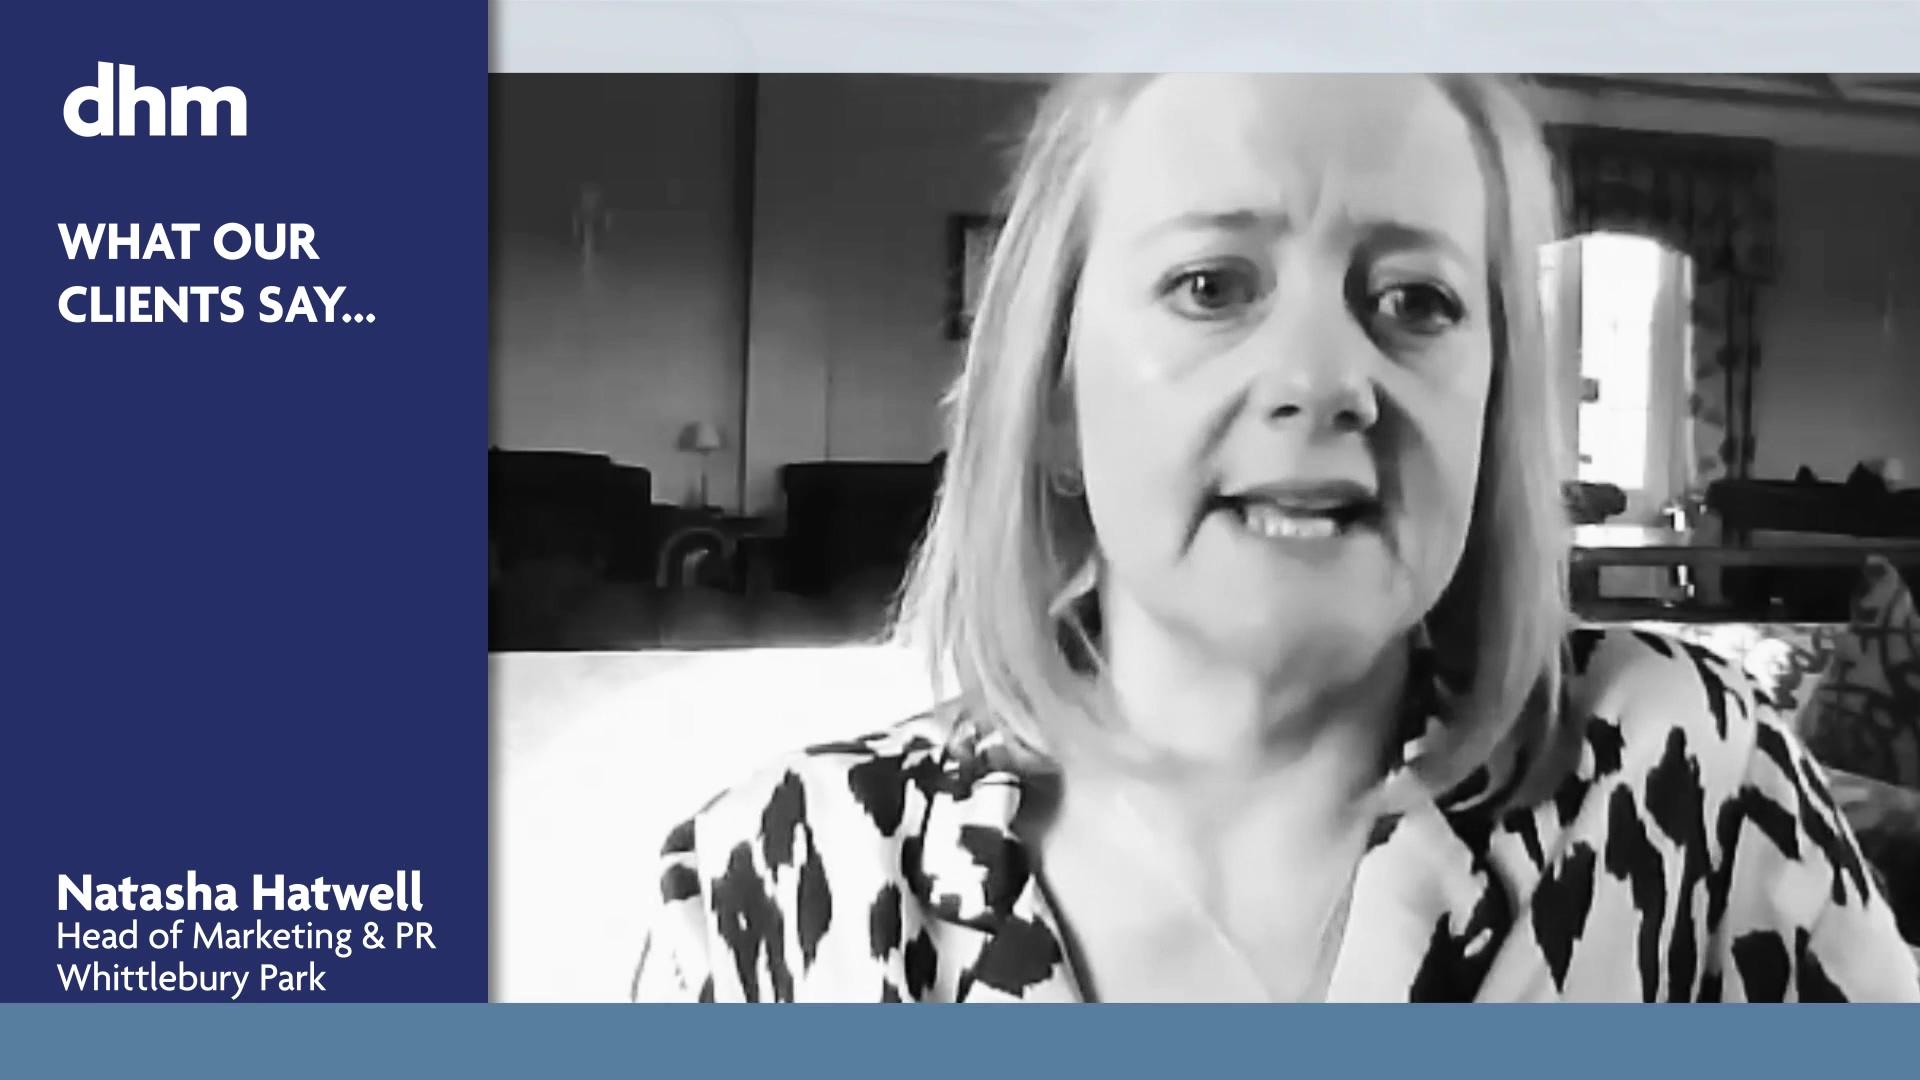 DHM - Natasha Hatwell Testimonial (FULL) v2